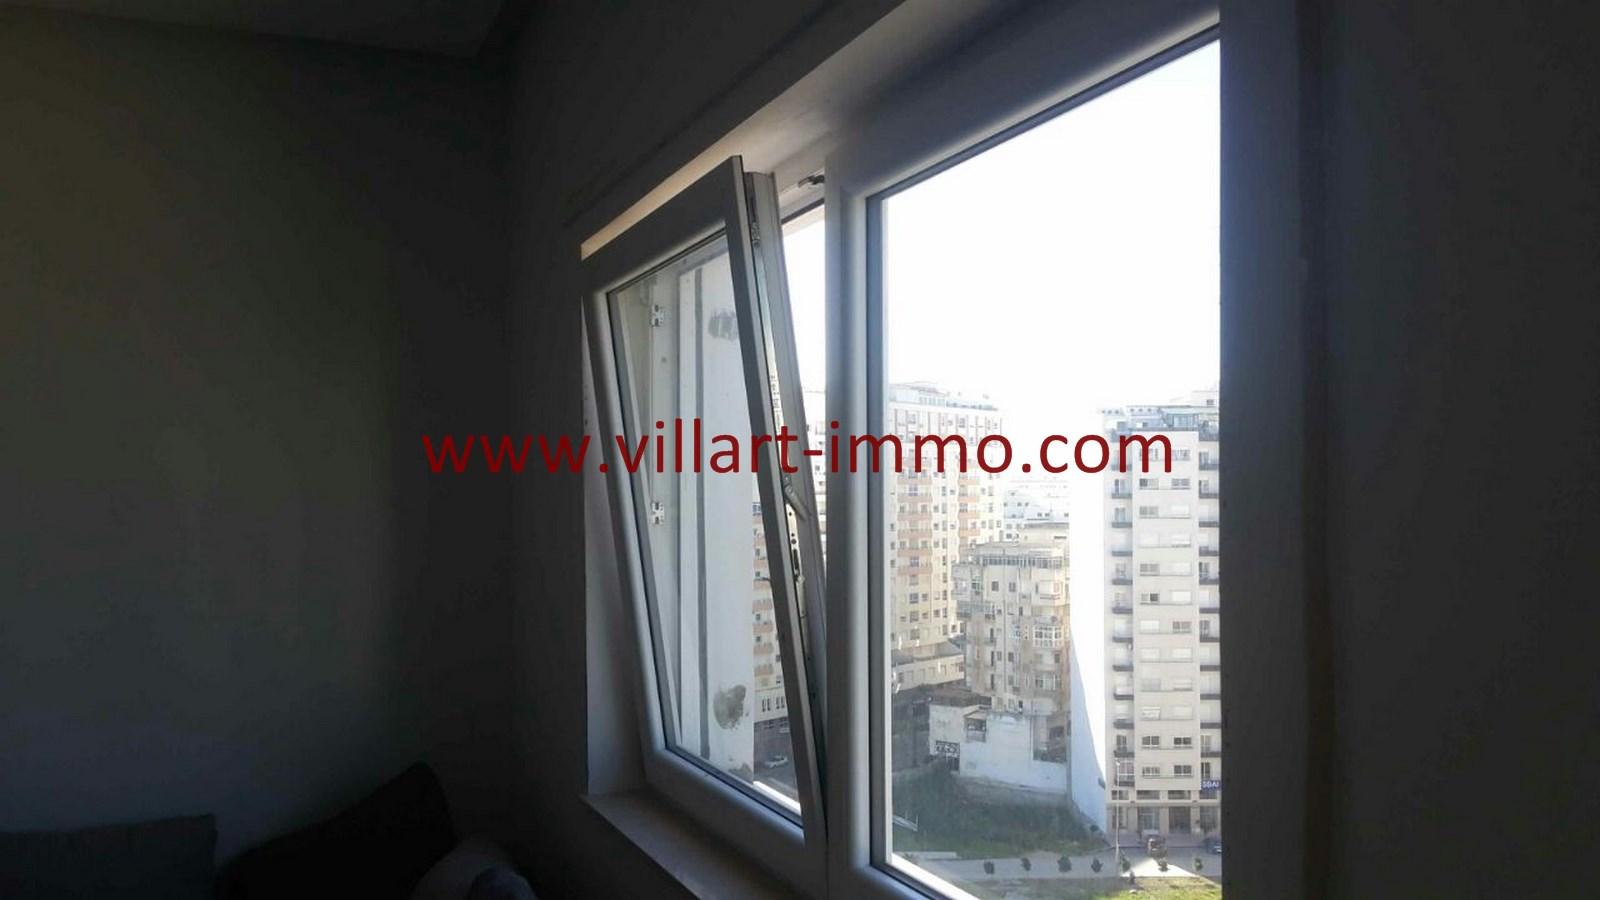 9-Vente-Appartement-Tanger-Malabata-Vue-Ville-VA490-Villart Immo (Copier)